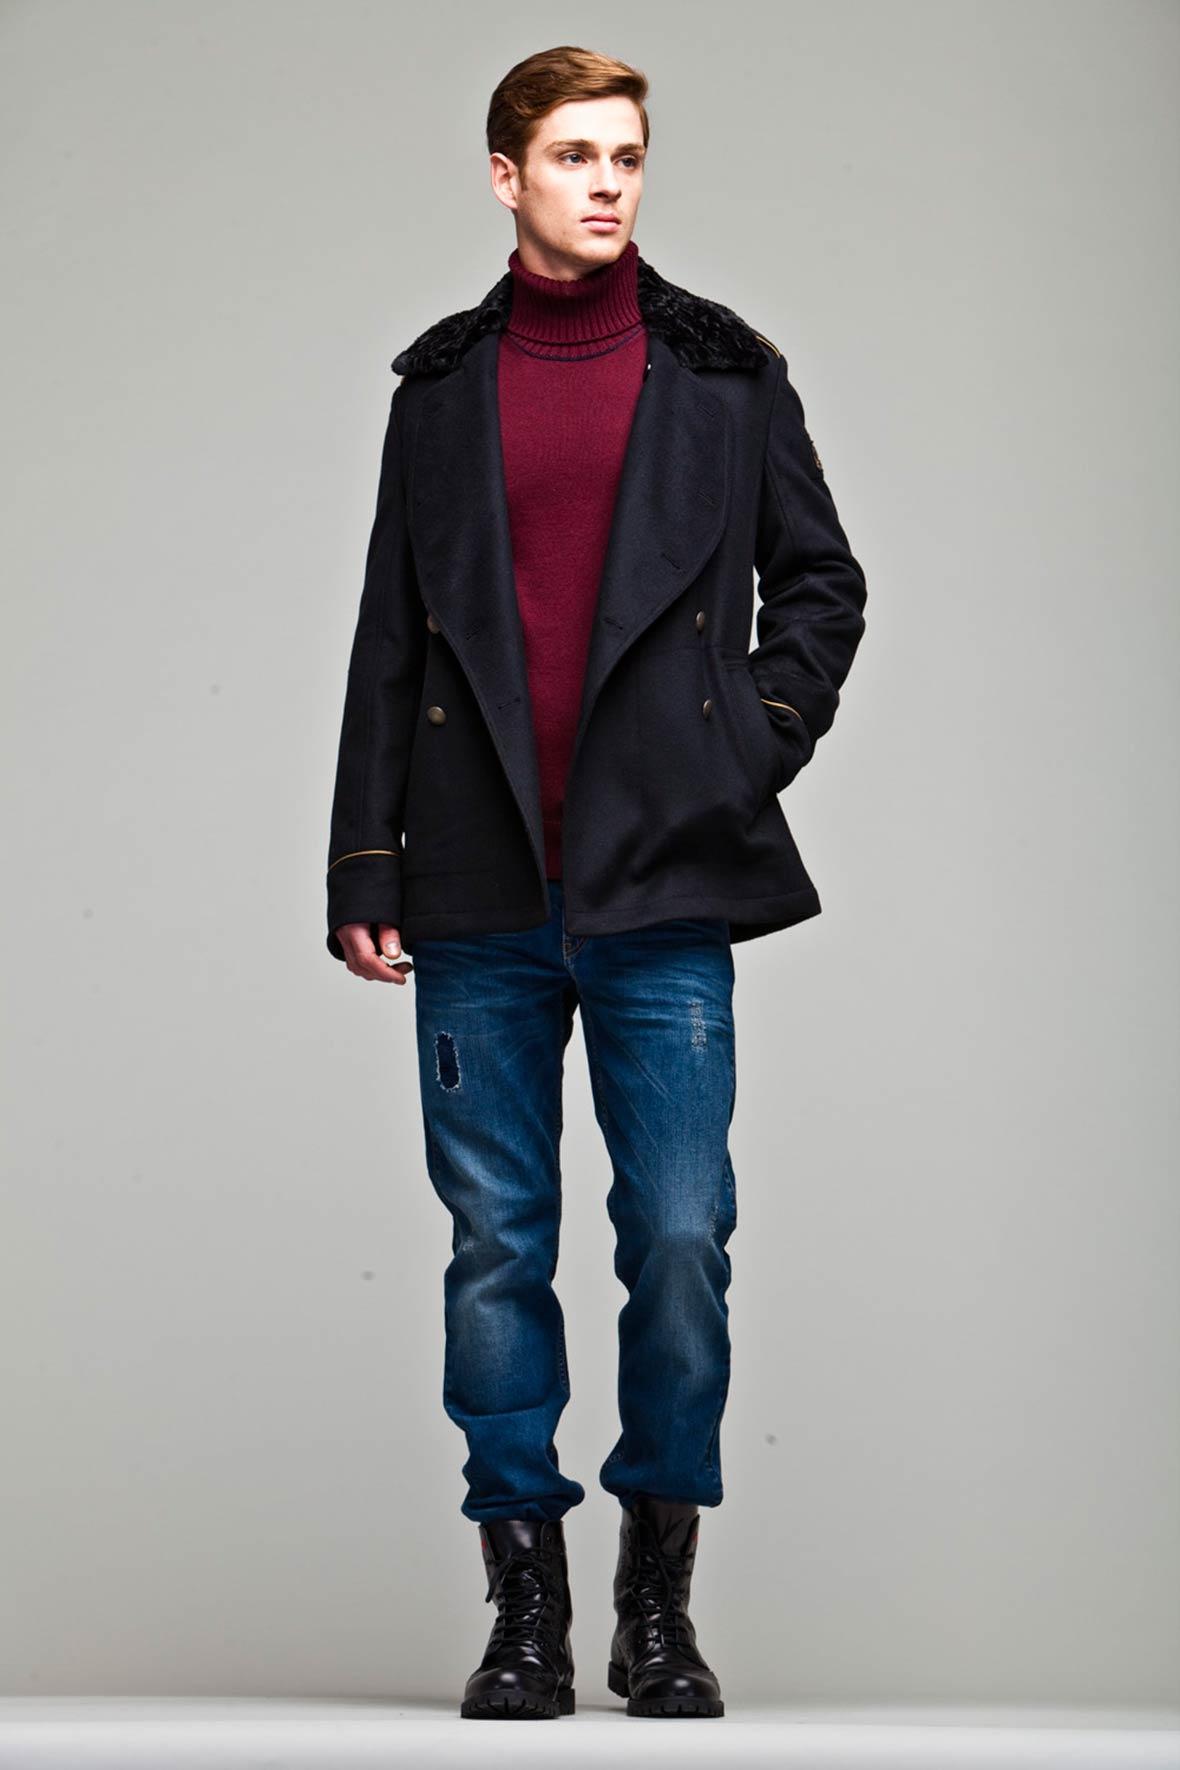 Lucas Mascarini Graces Love Moschino Fall/Winter 2013 Lookbook